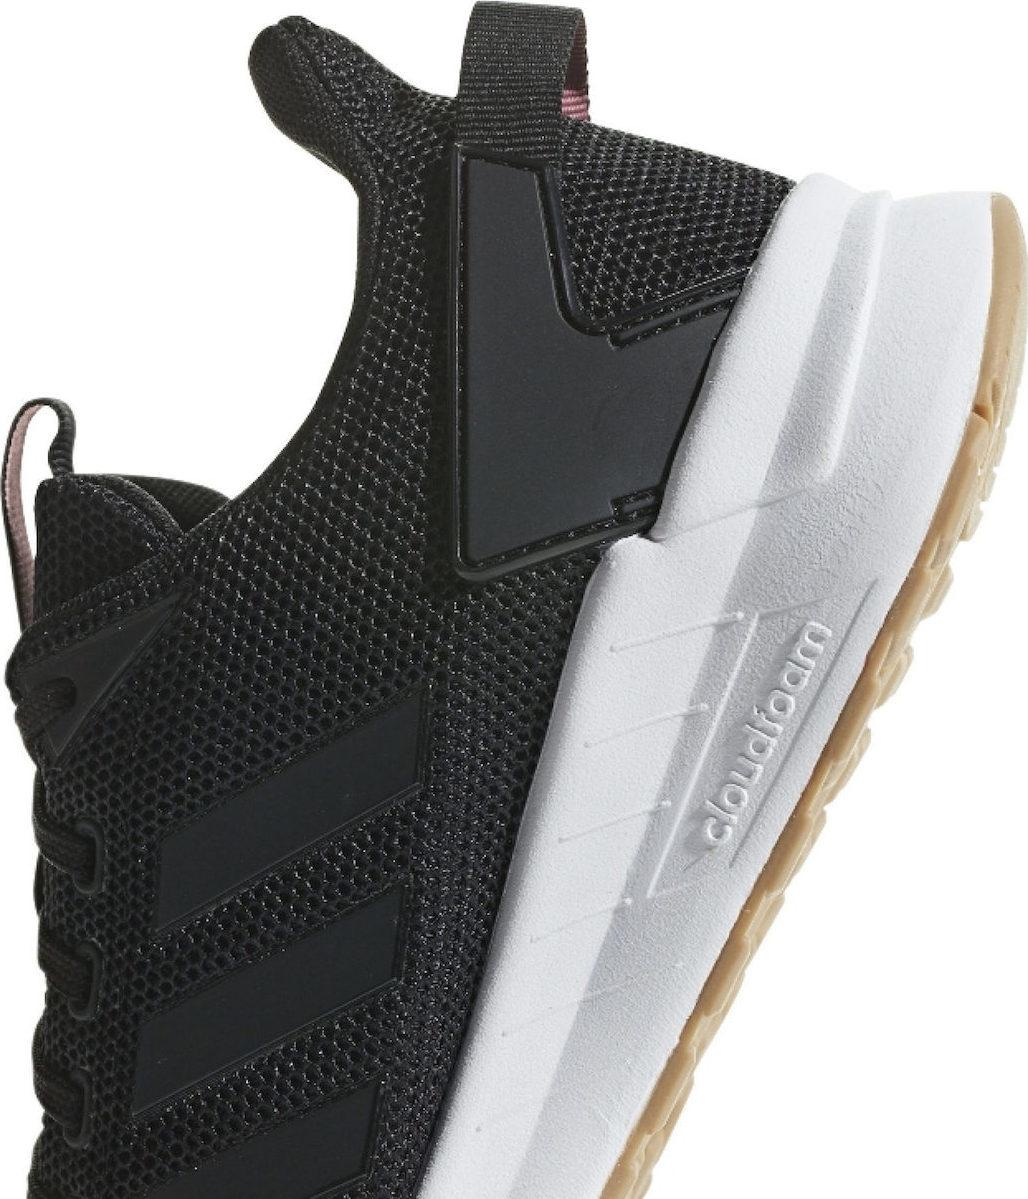 5e0ef732f34 Adidas Questar Ride · Adidas Questar Ride · Adidas Questar Ride